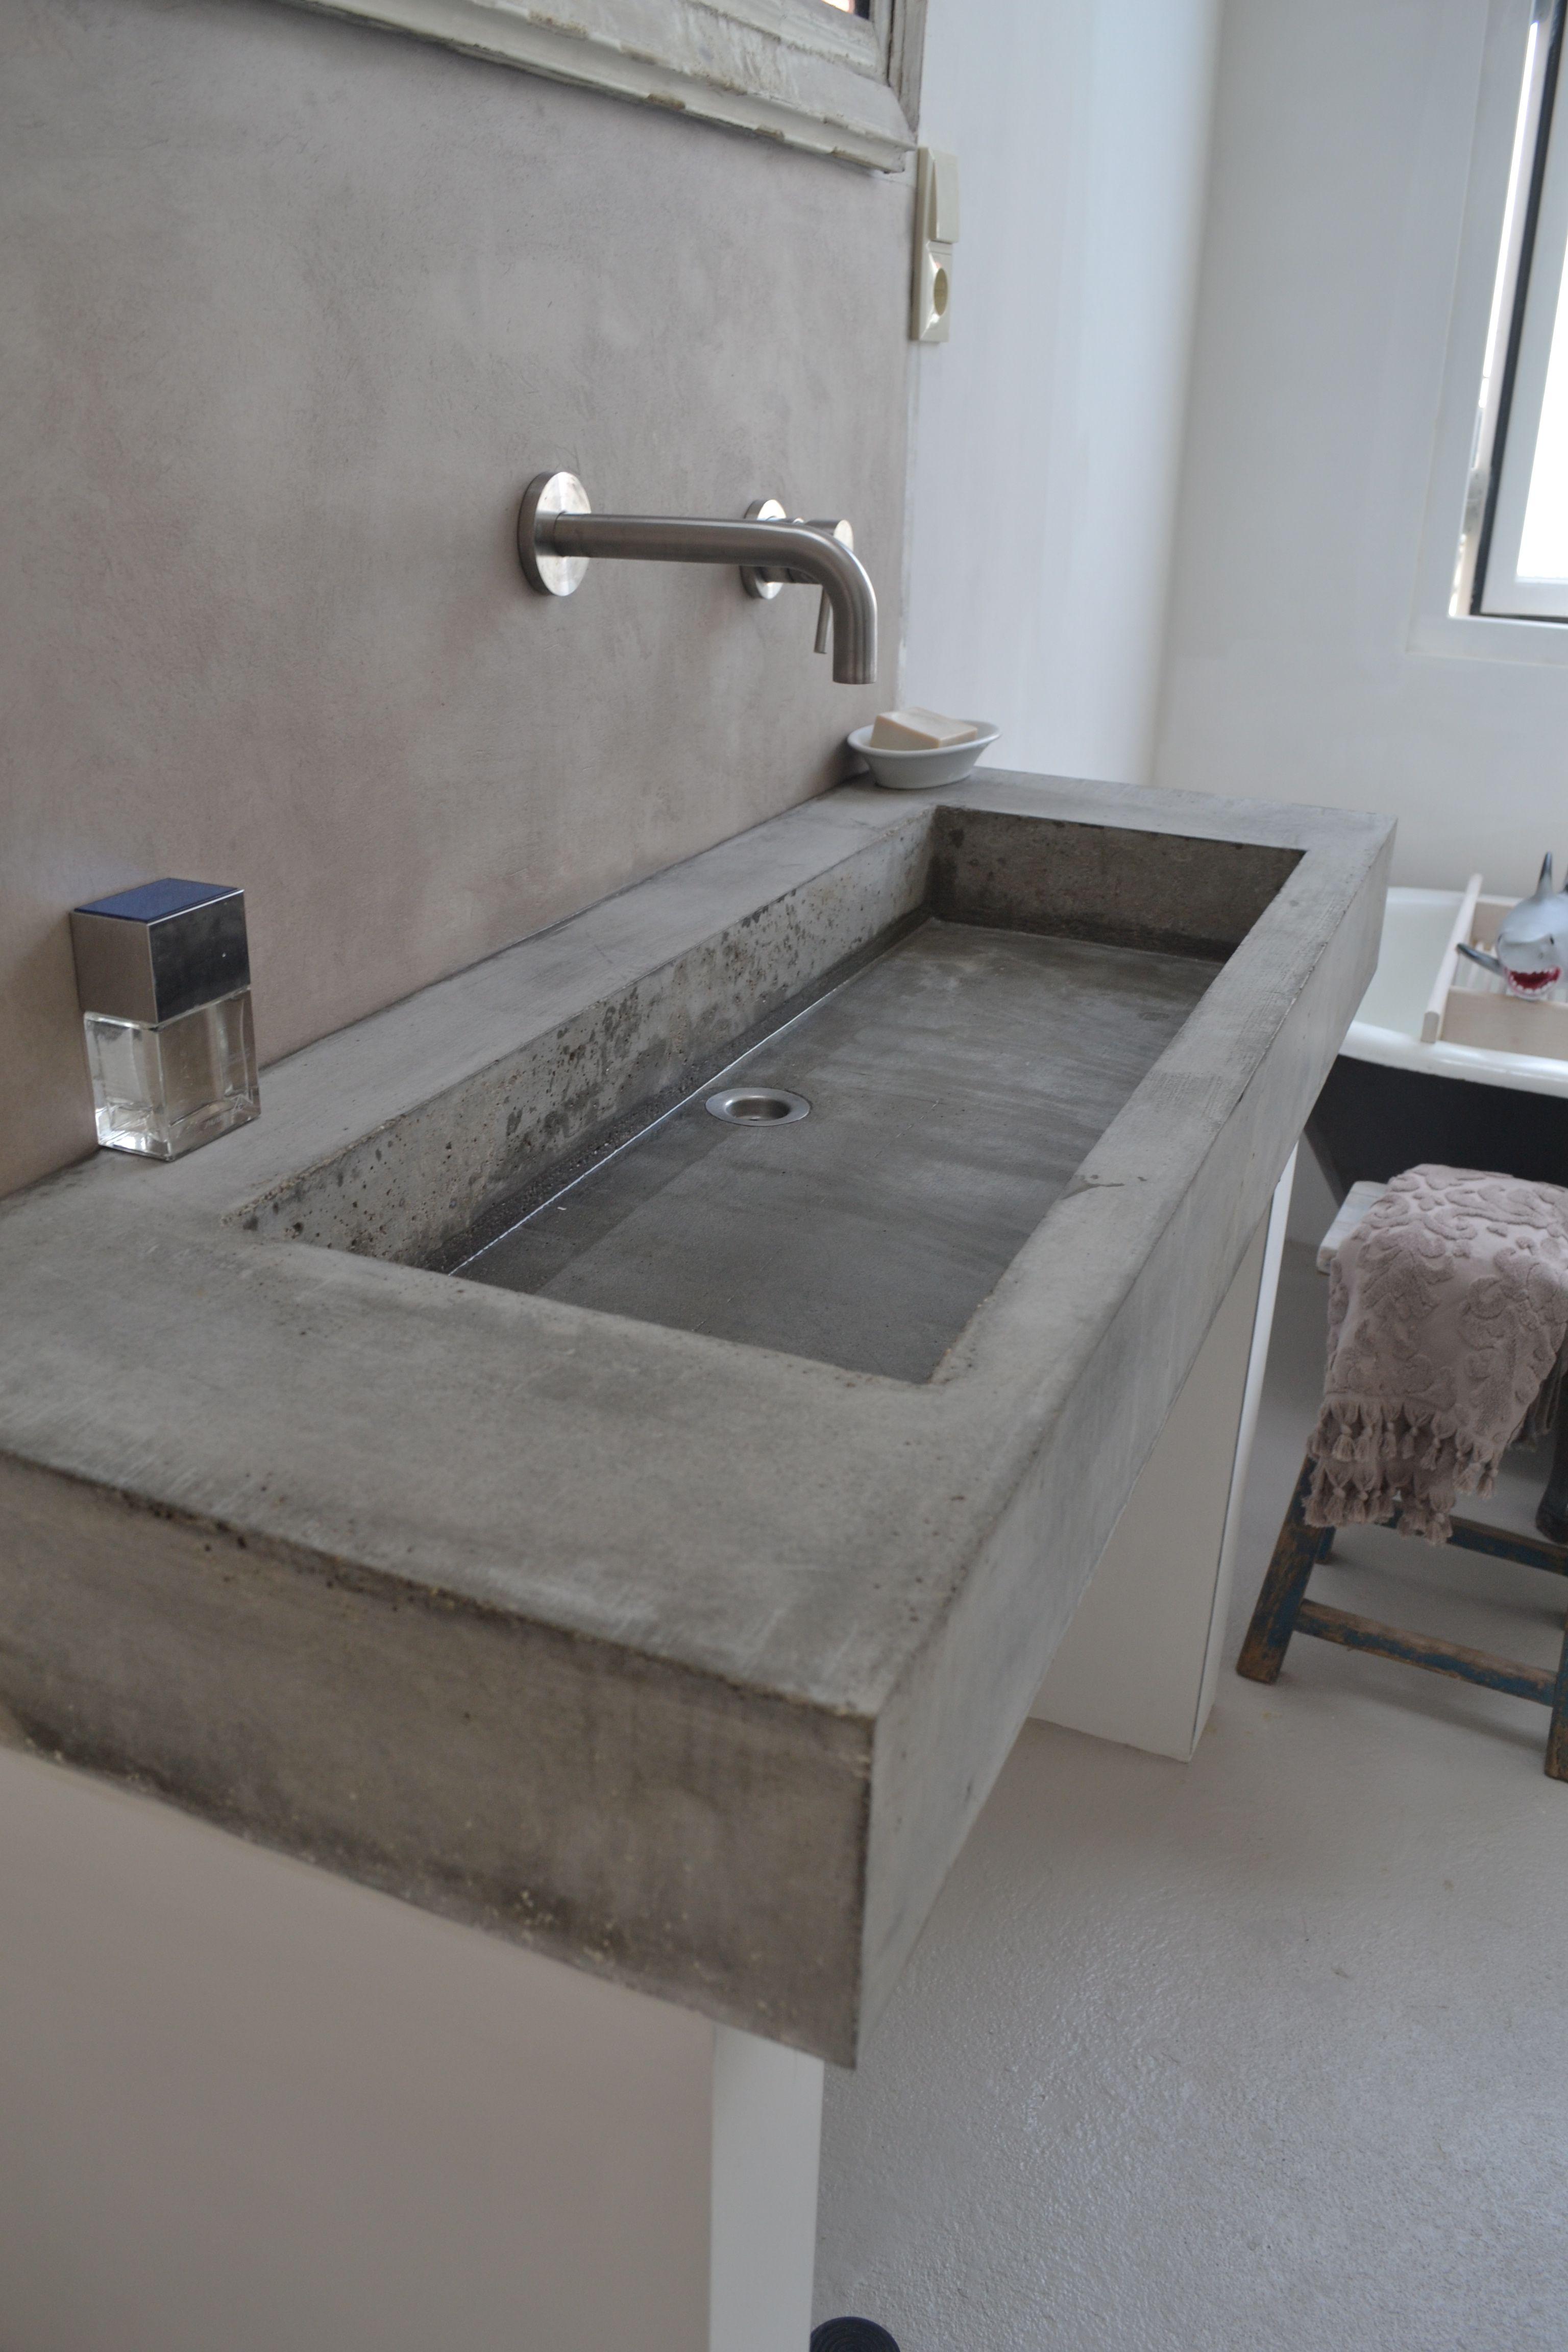 lavabo in cemento #concrete #bathroom | Home | Pinterest | Cuarto de ...